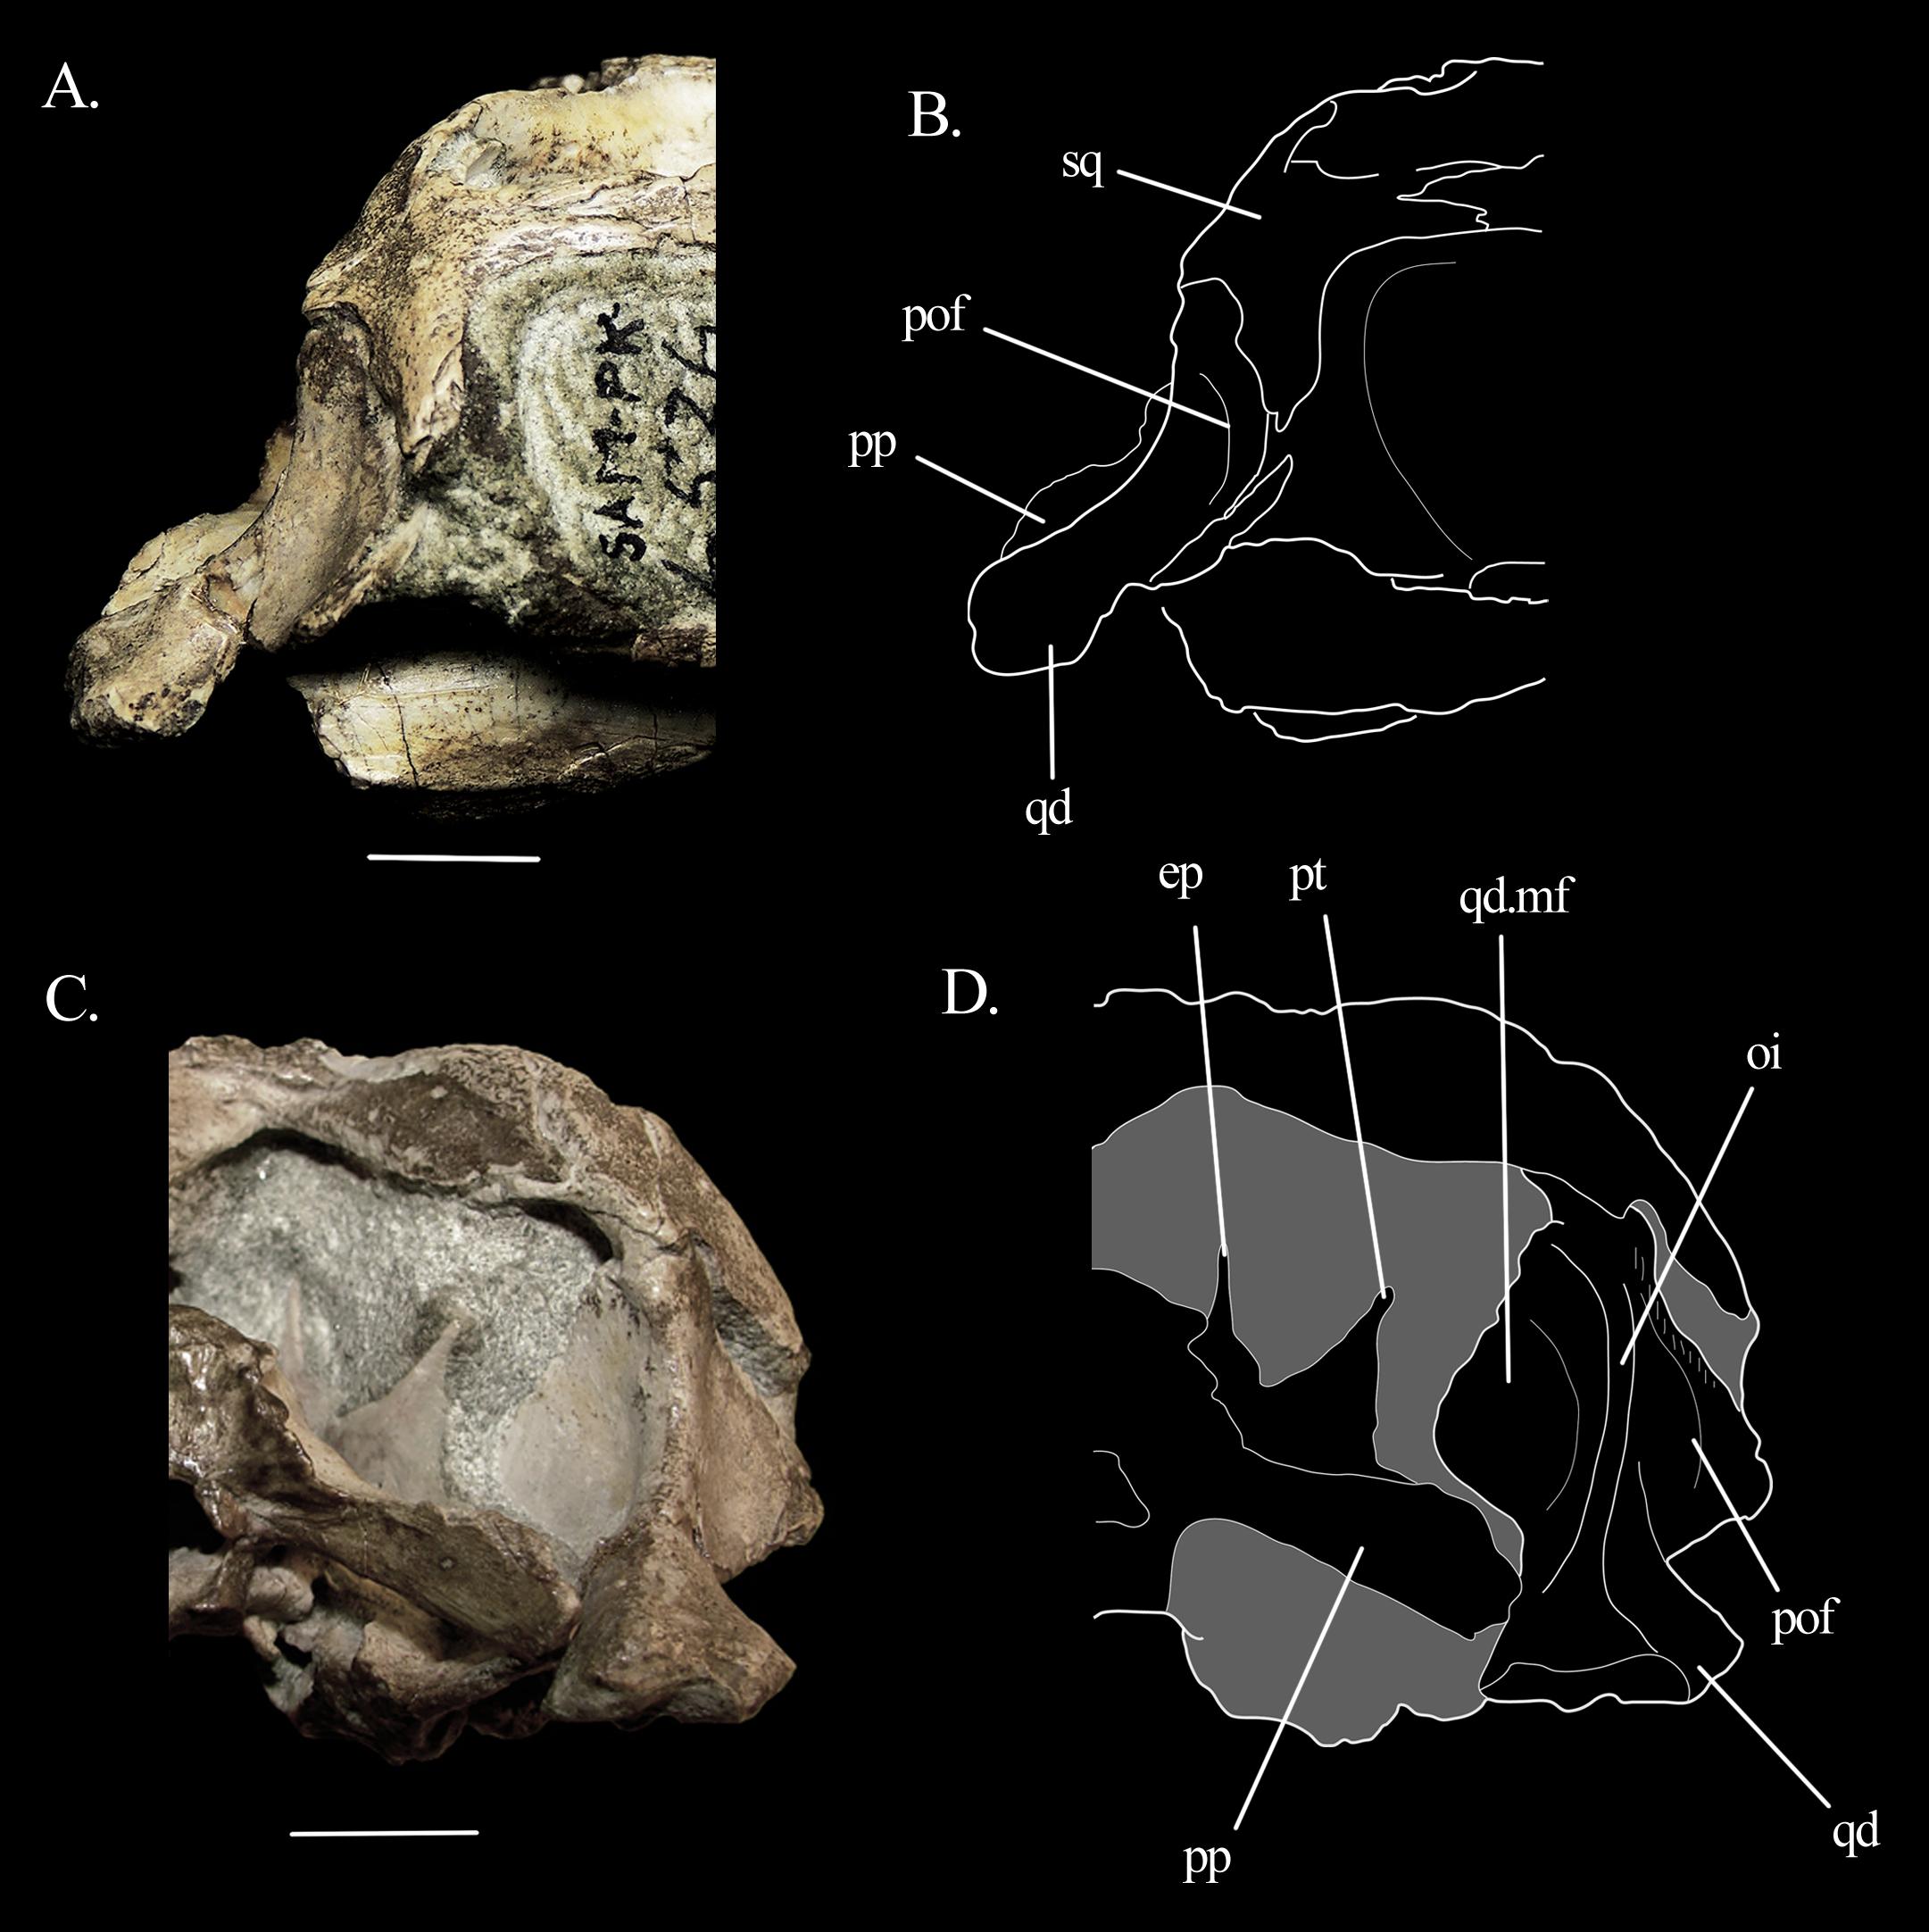 The braincase of Mesosuchus browni (Reptilia, Archosauromorpha) with